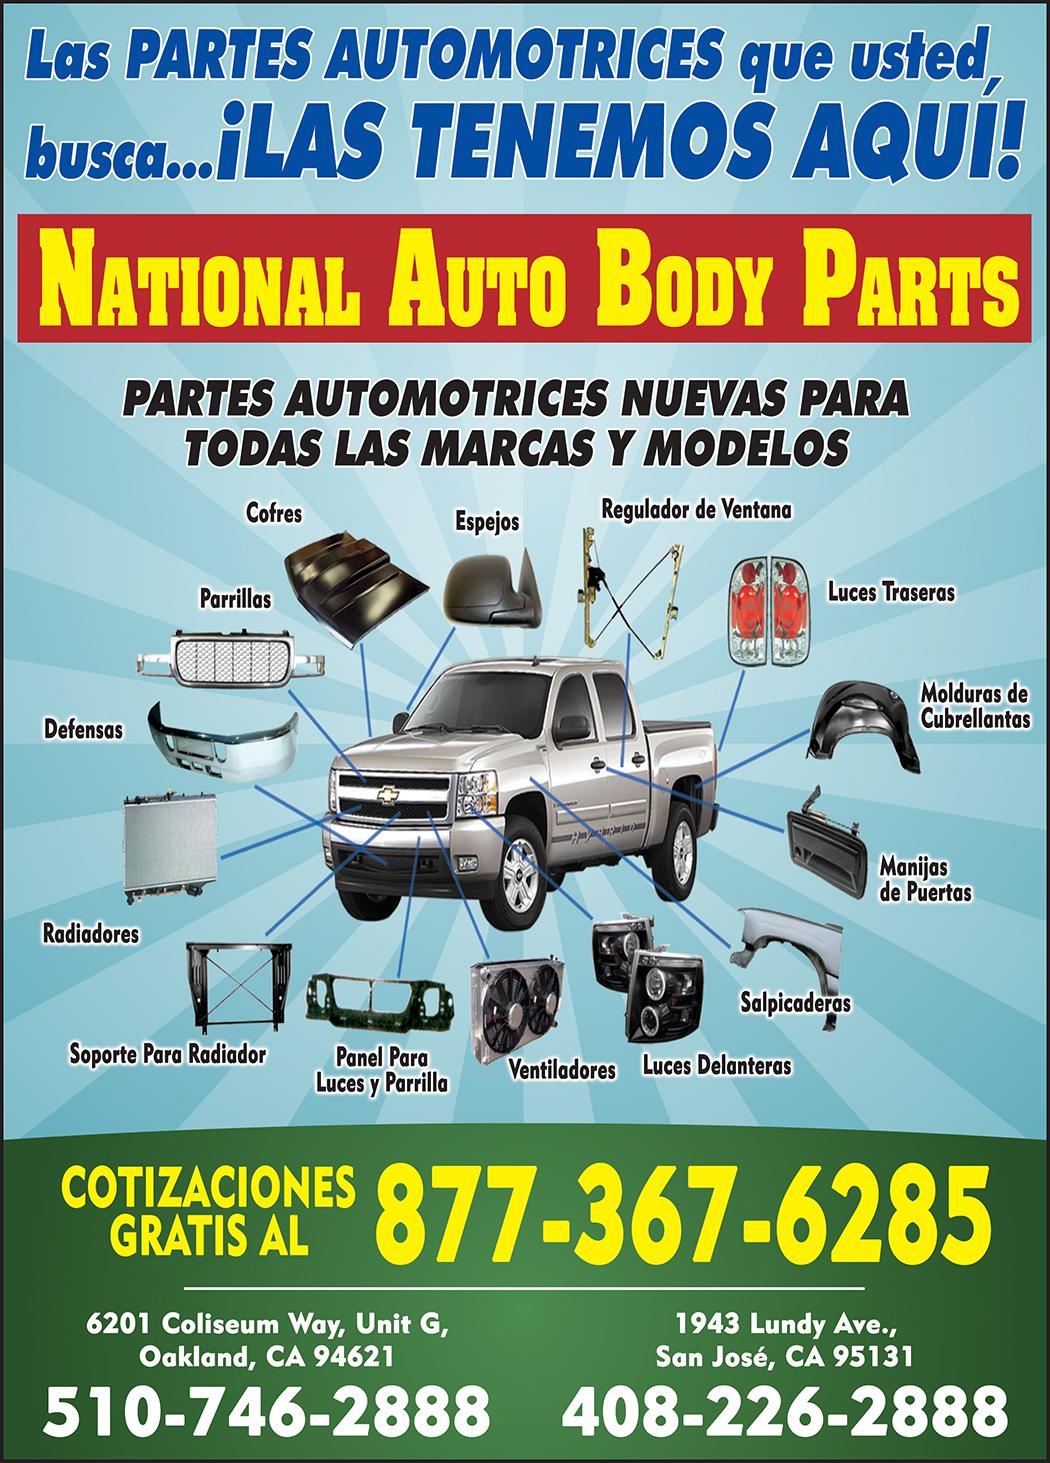 National Auto Body Parts 1 PAG Agosto 2018.jpg